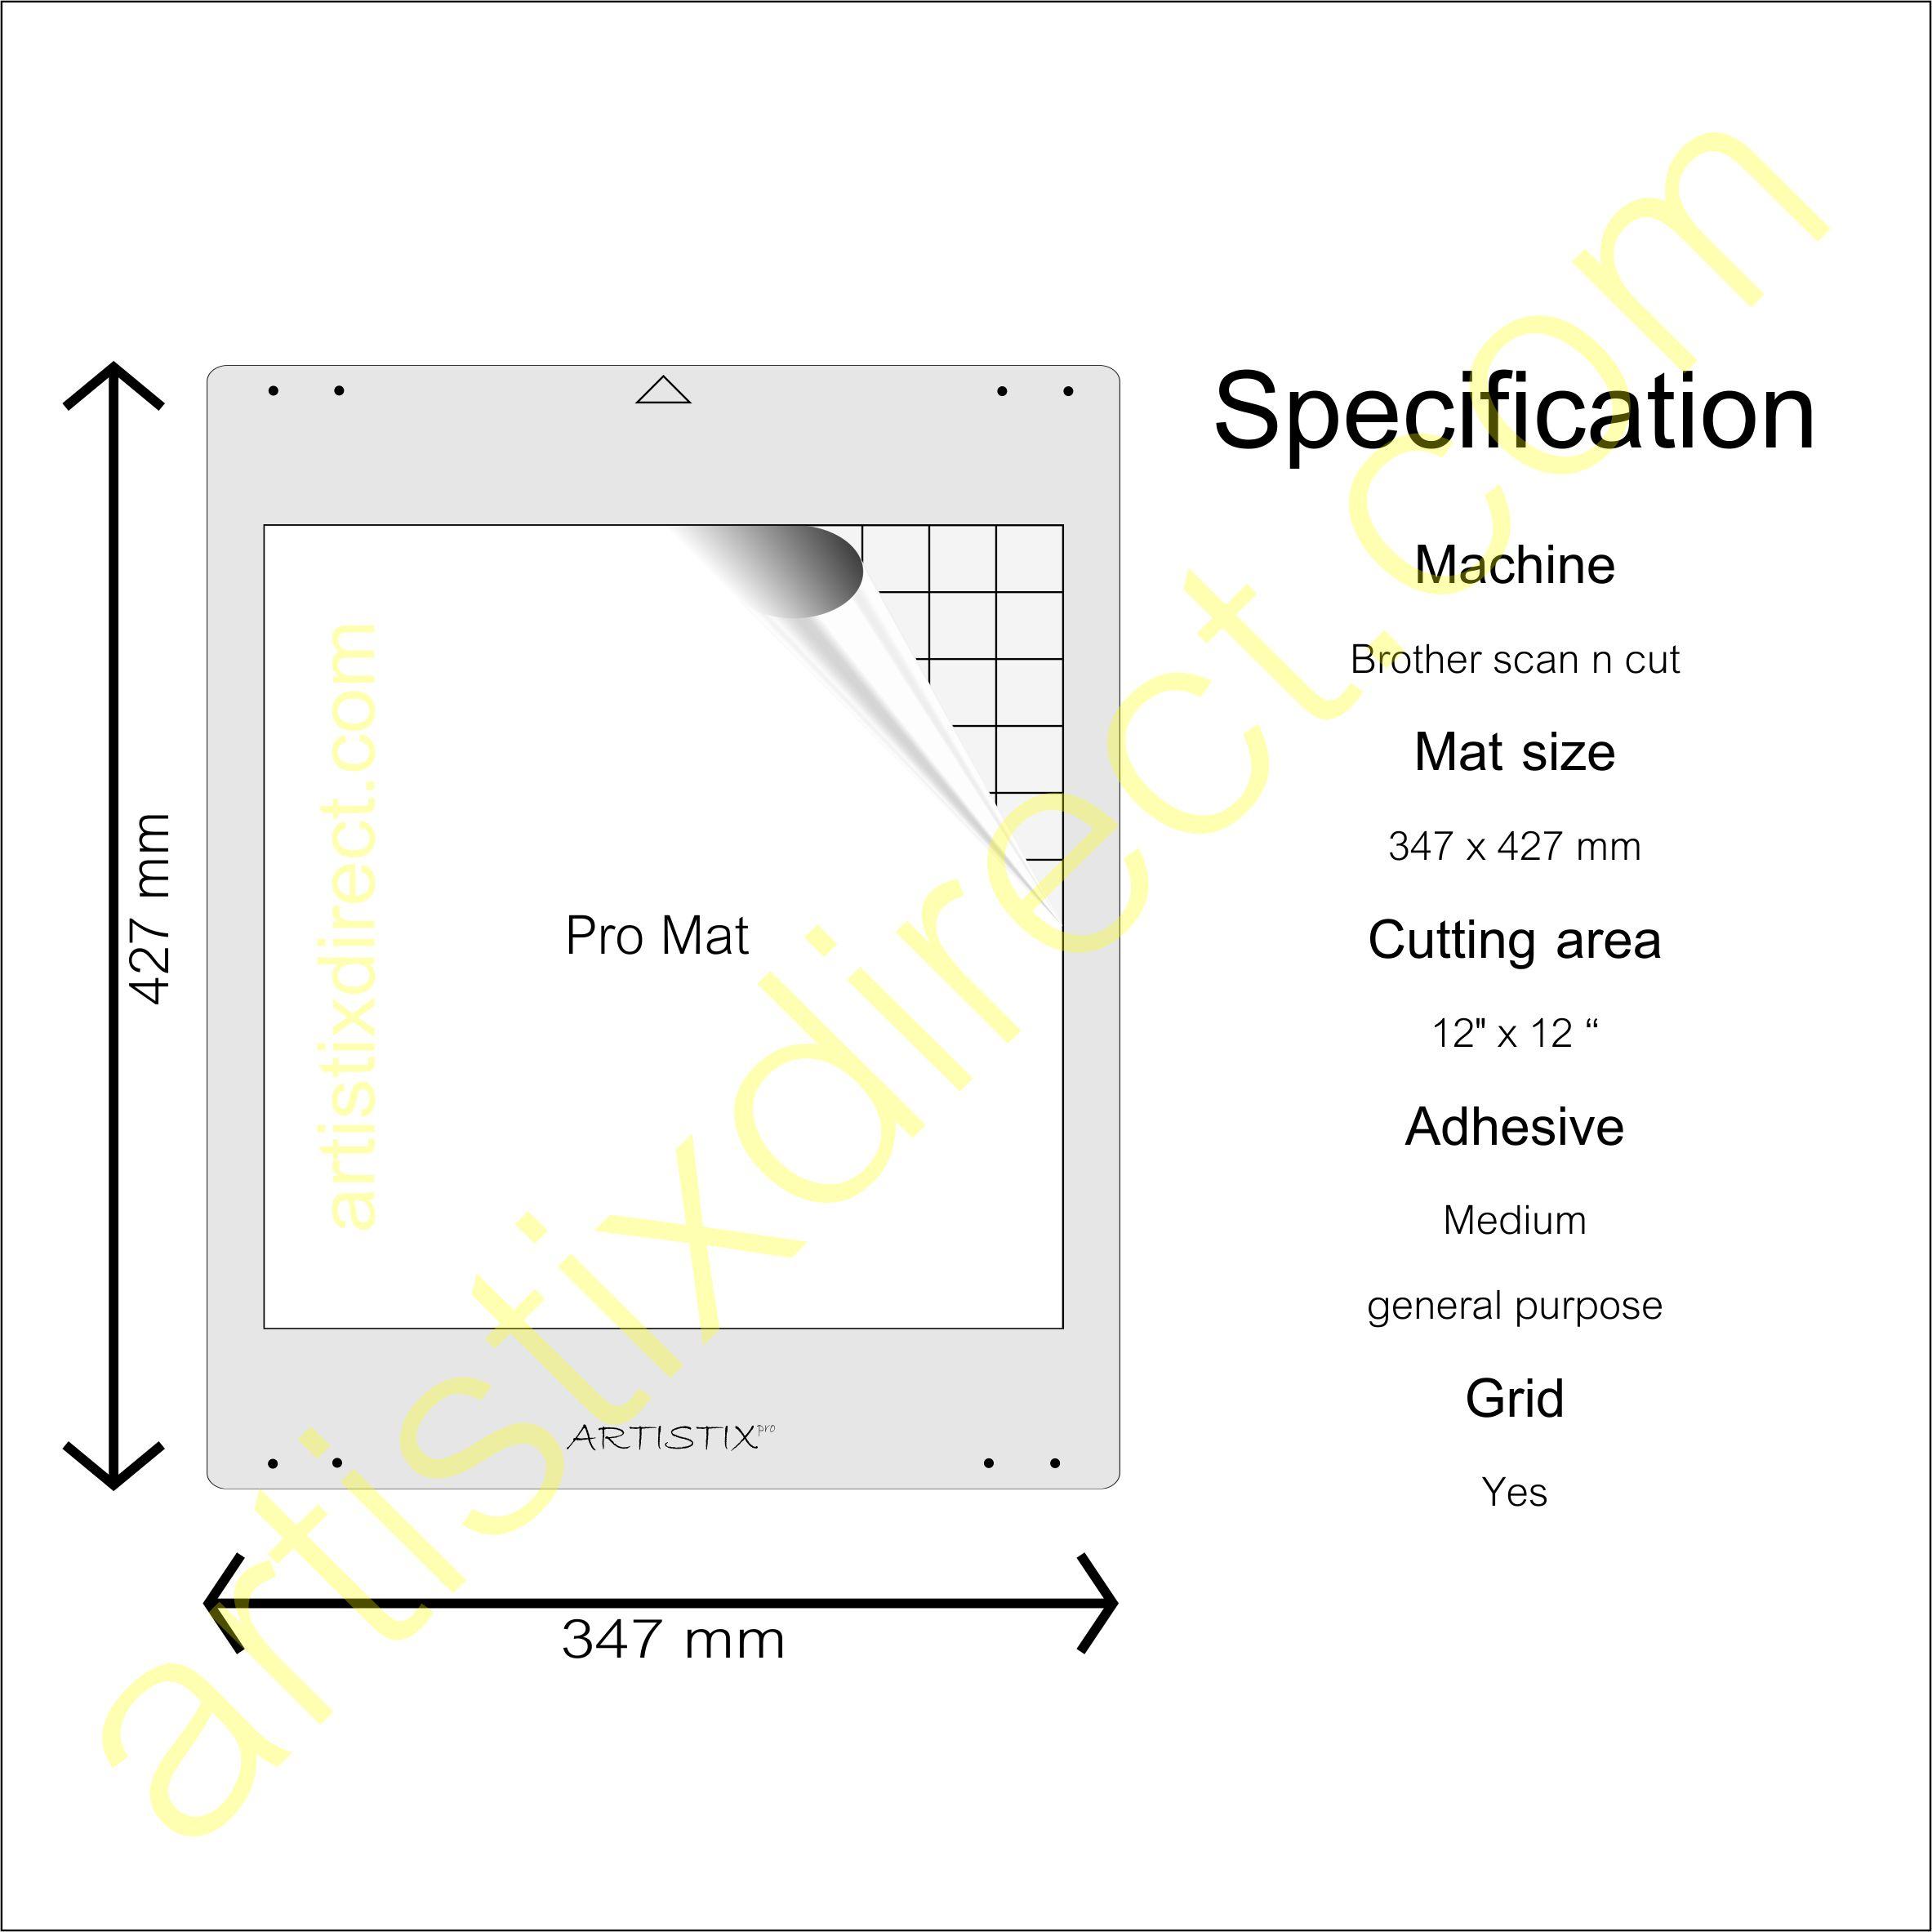 Artistix Pro 12 X 12 Carrier Sheet Cutting Mat For The Brother Scan N Cut Scanncut